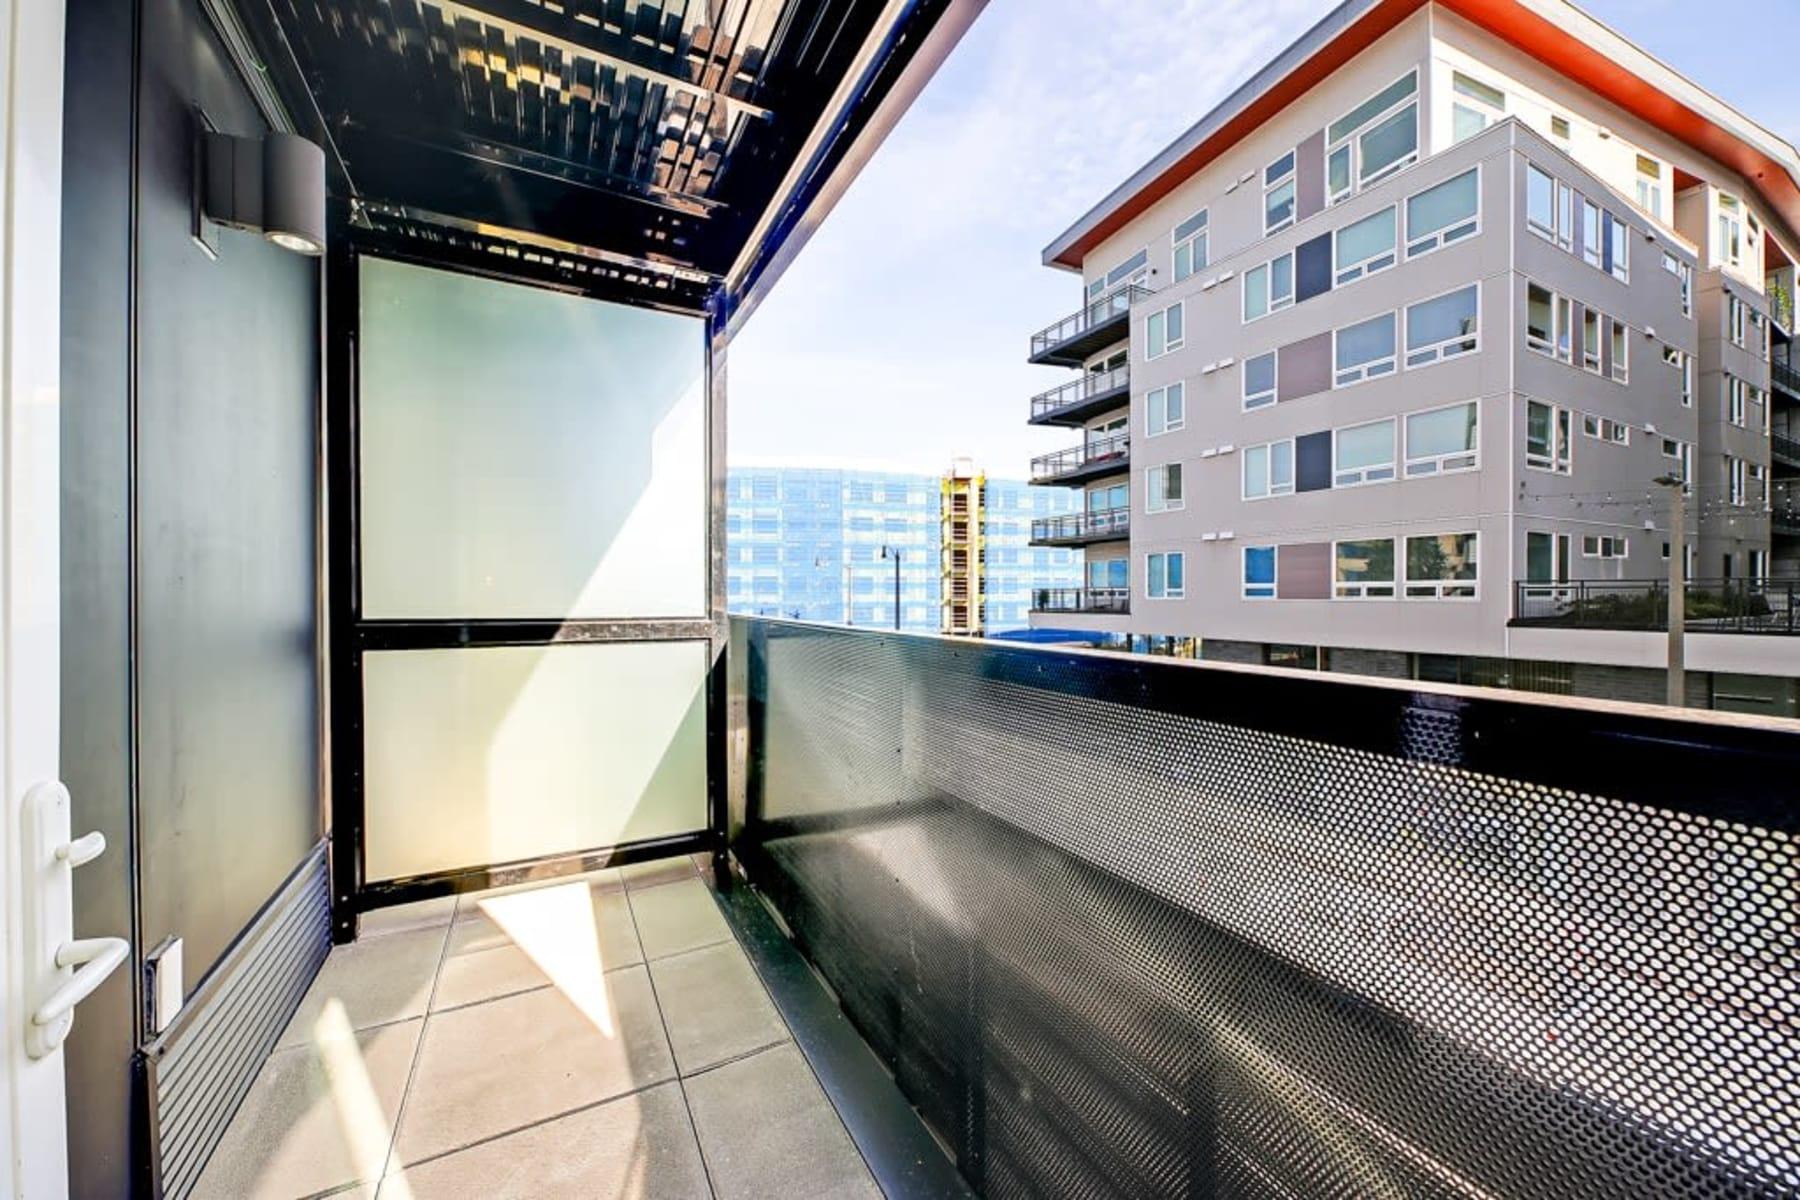 Blackbird in Redmond, Washington offers a balcony